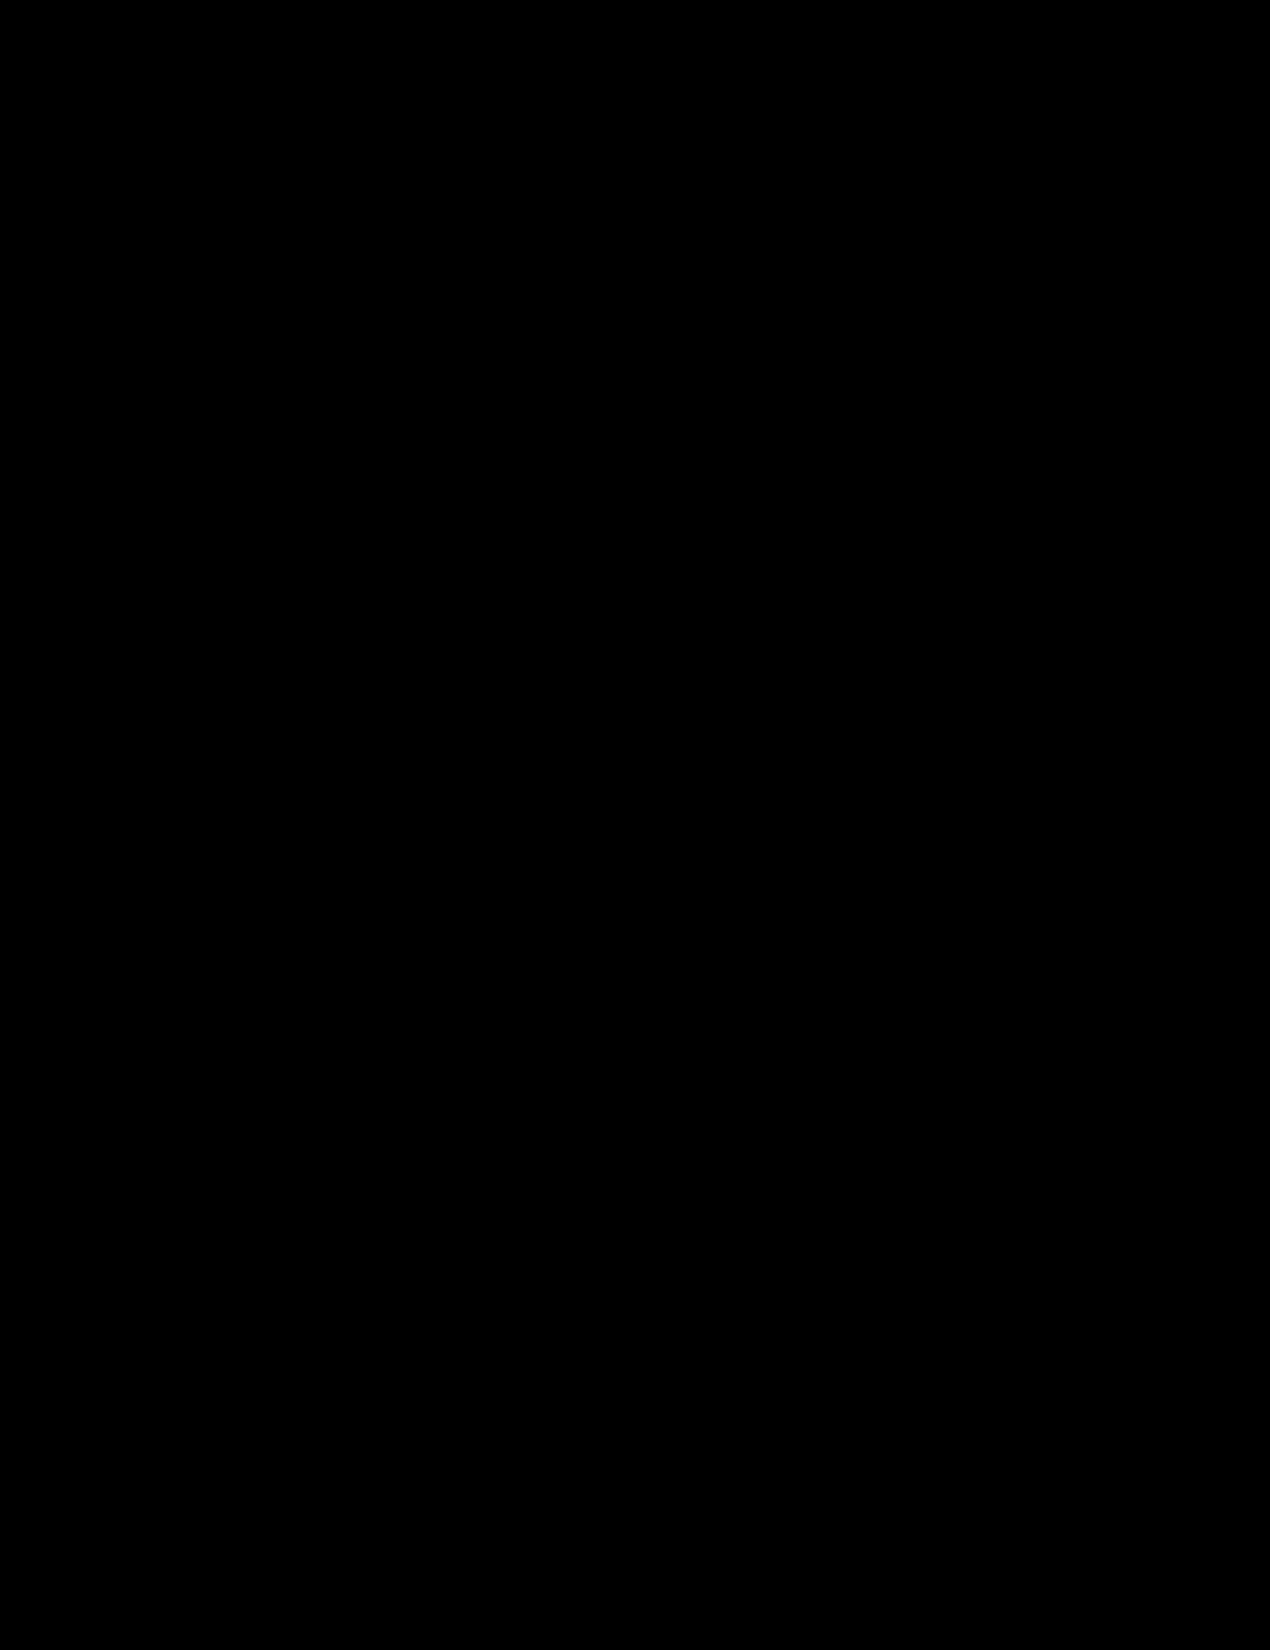 Spectrophotometric determination of an equilibrium constant